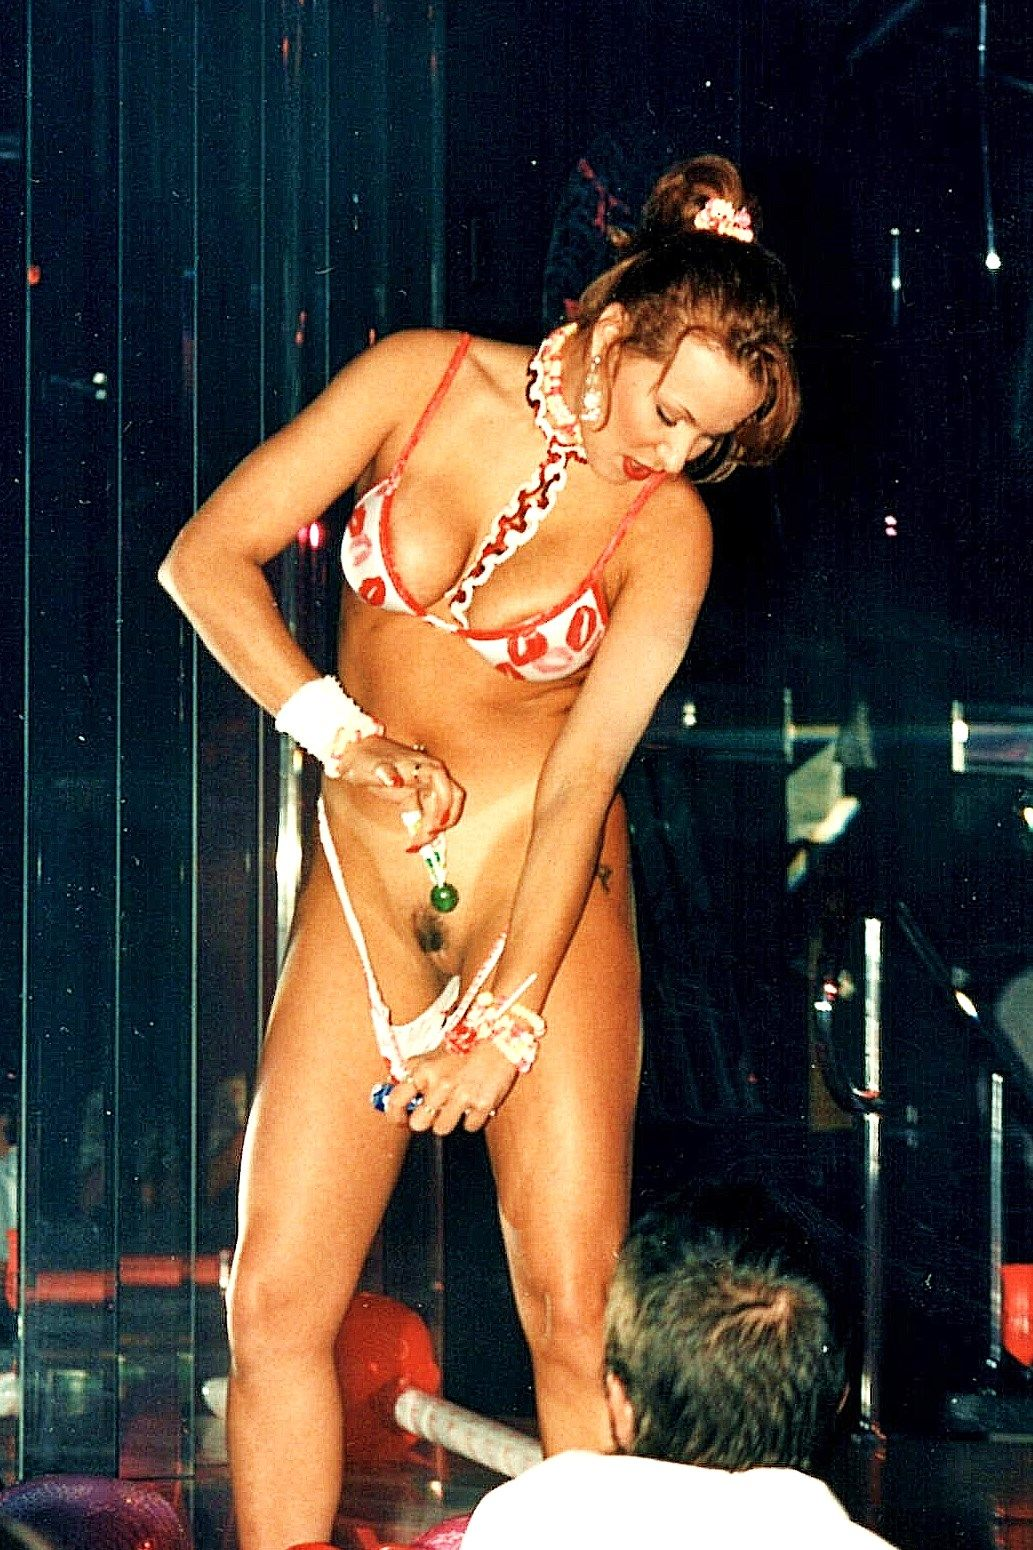 Amateur sex female orgasm photos